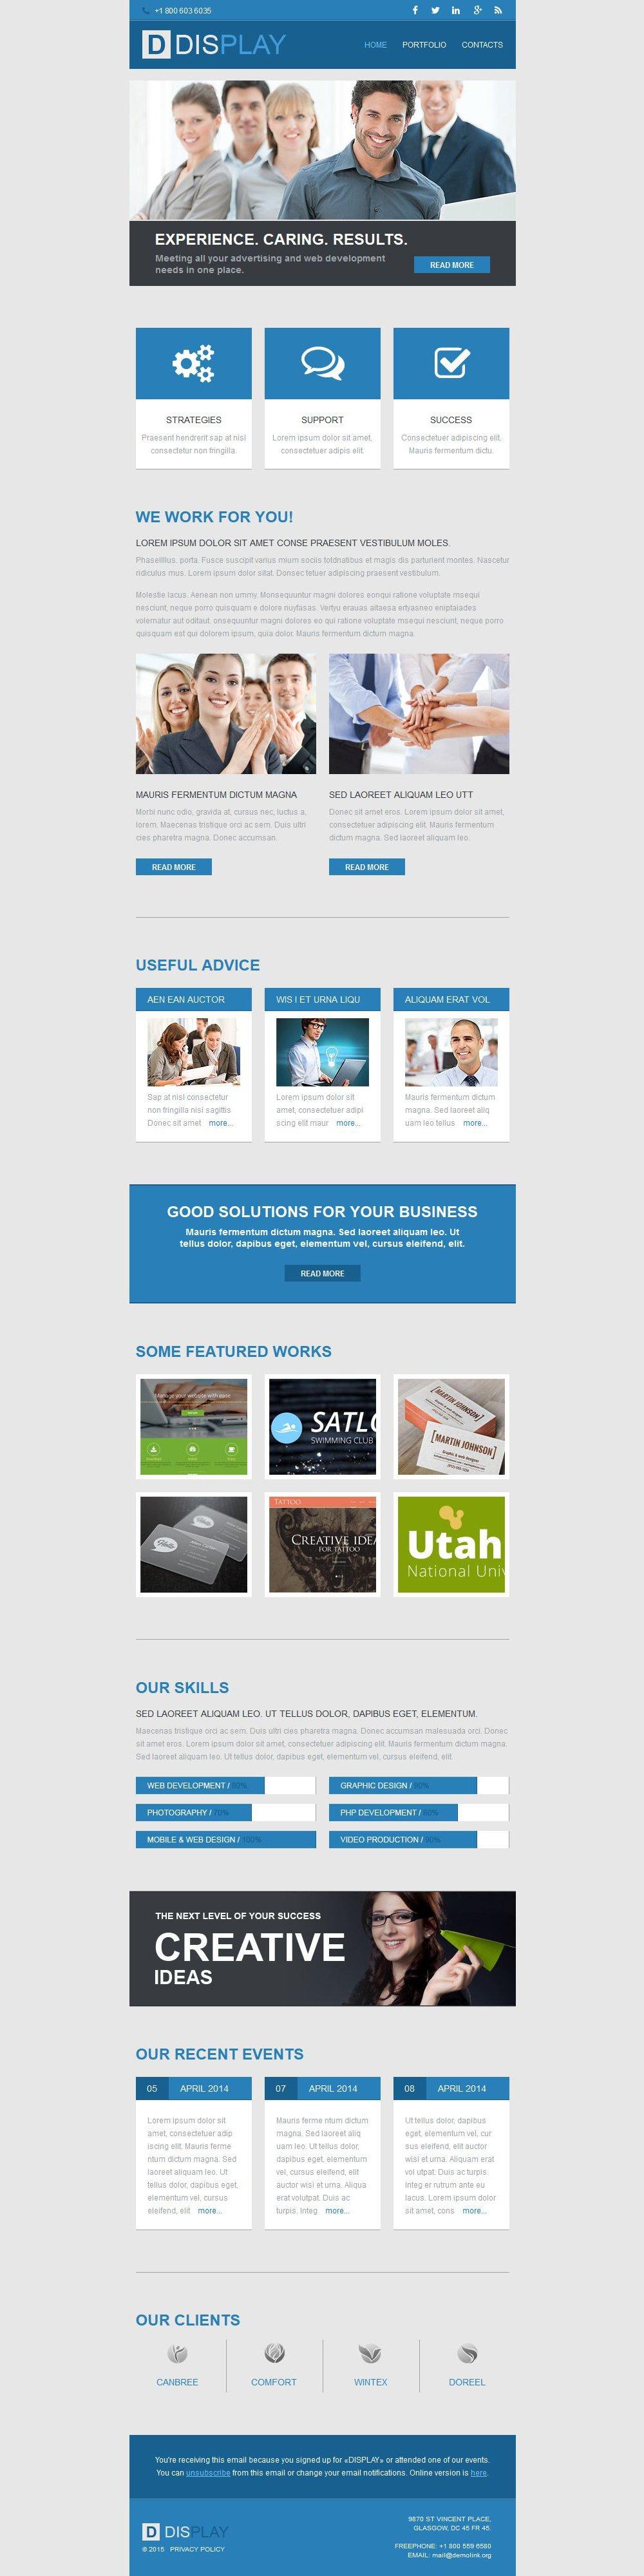 Web Design Newsletter Templates | TemplateMonster